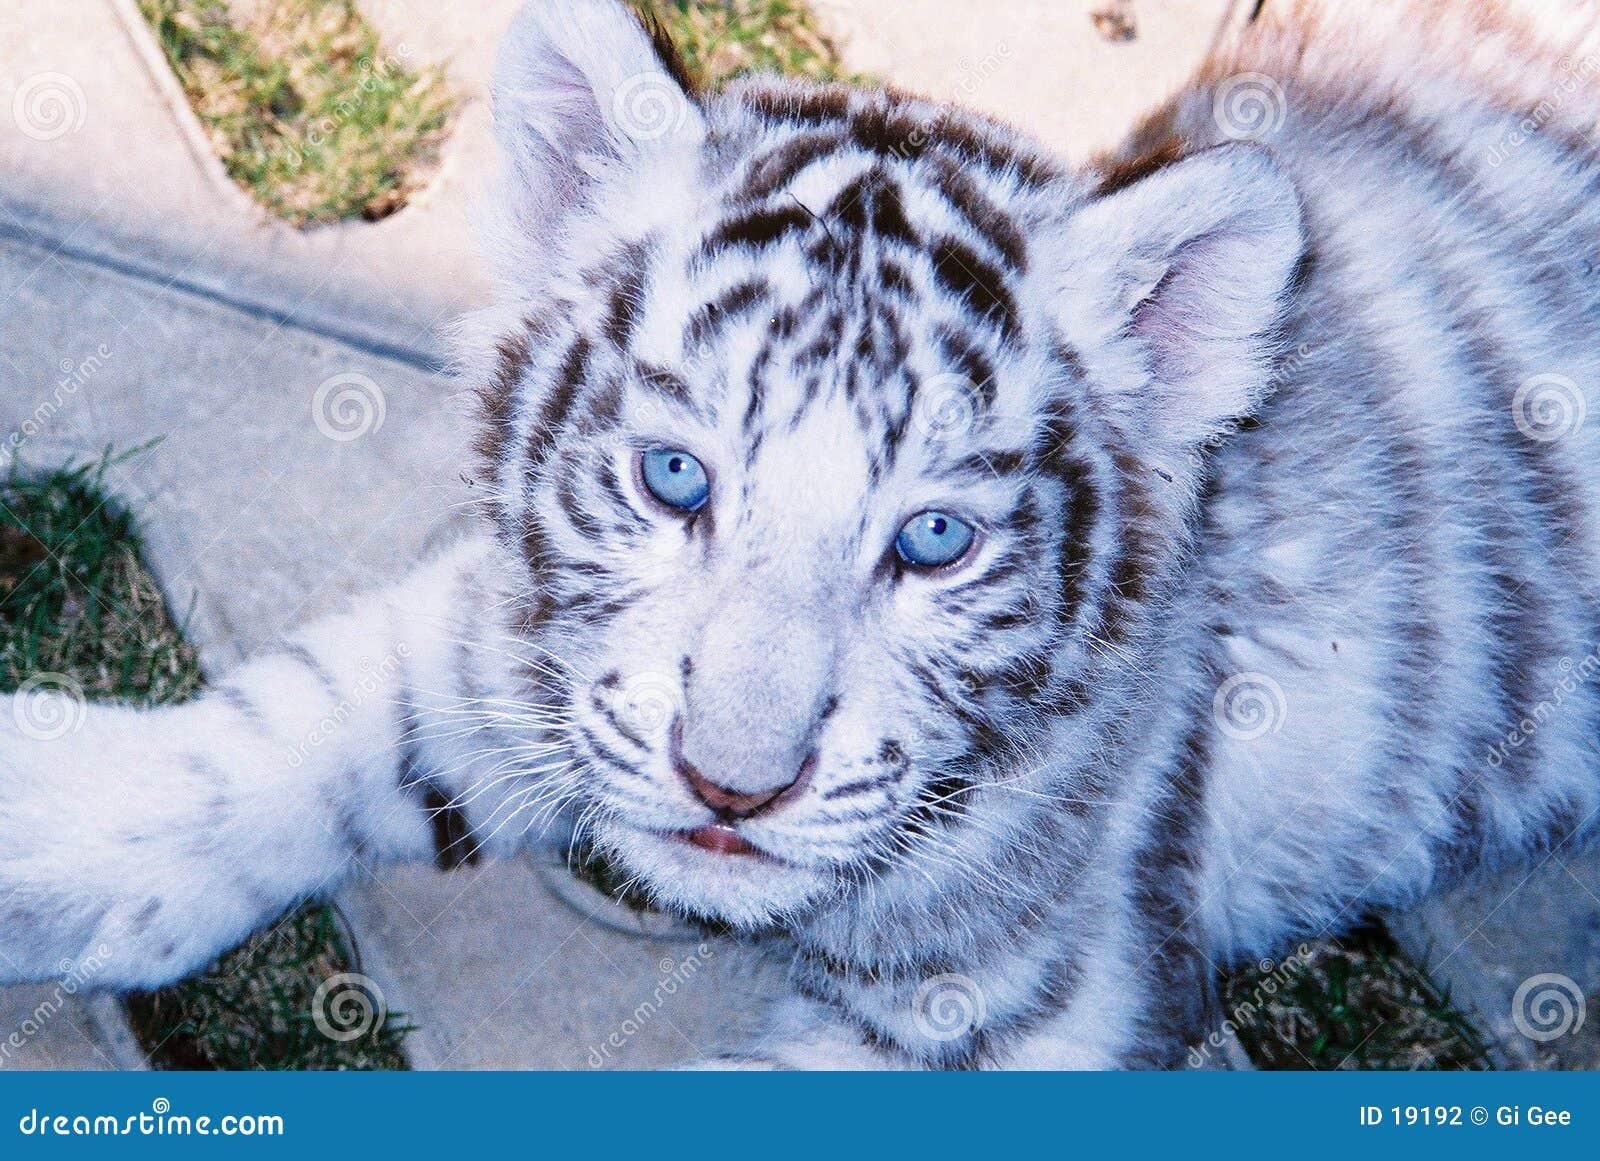 Tigre blanc de chéri dans les œil bleu